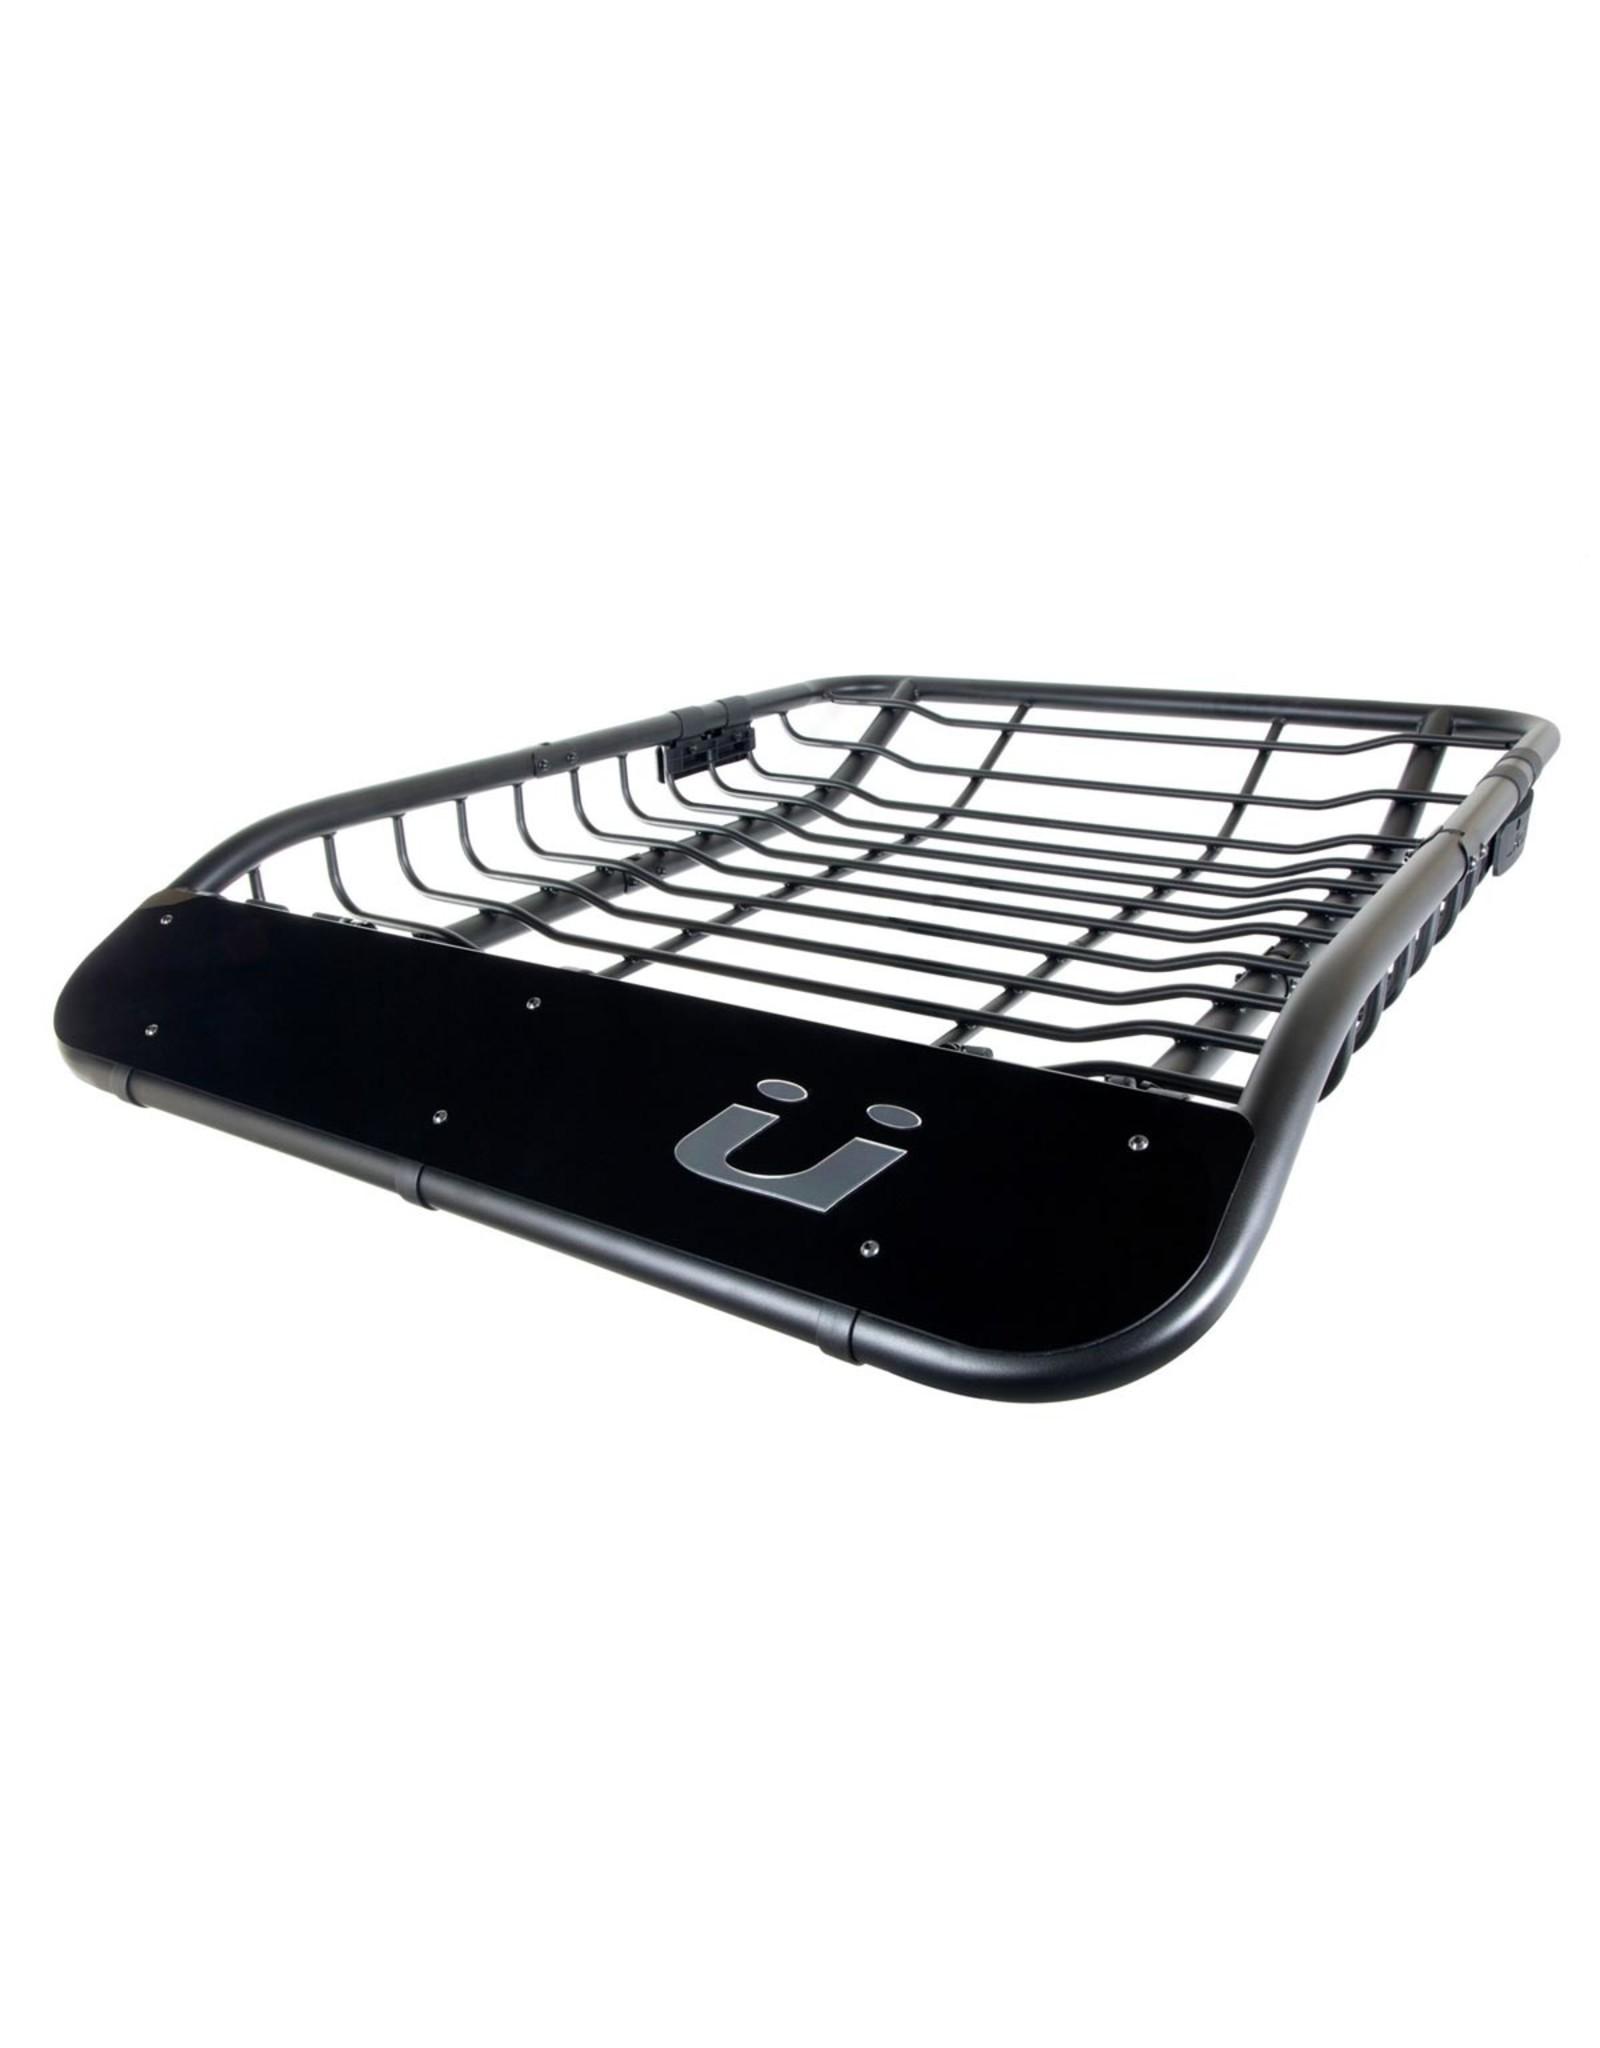 Kuat Vagabond X - Roof Basket - Black